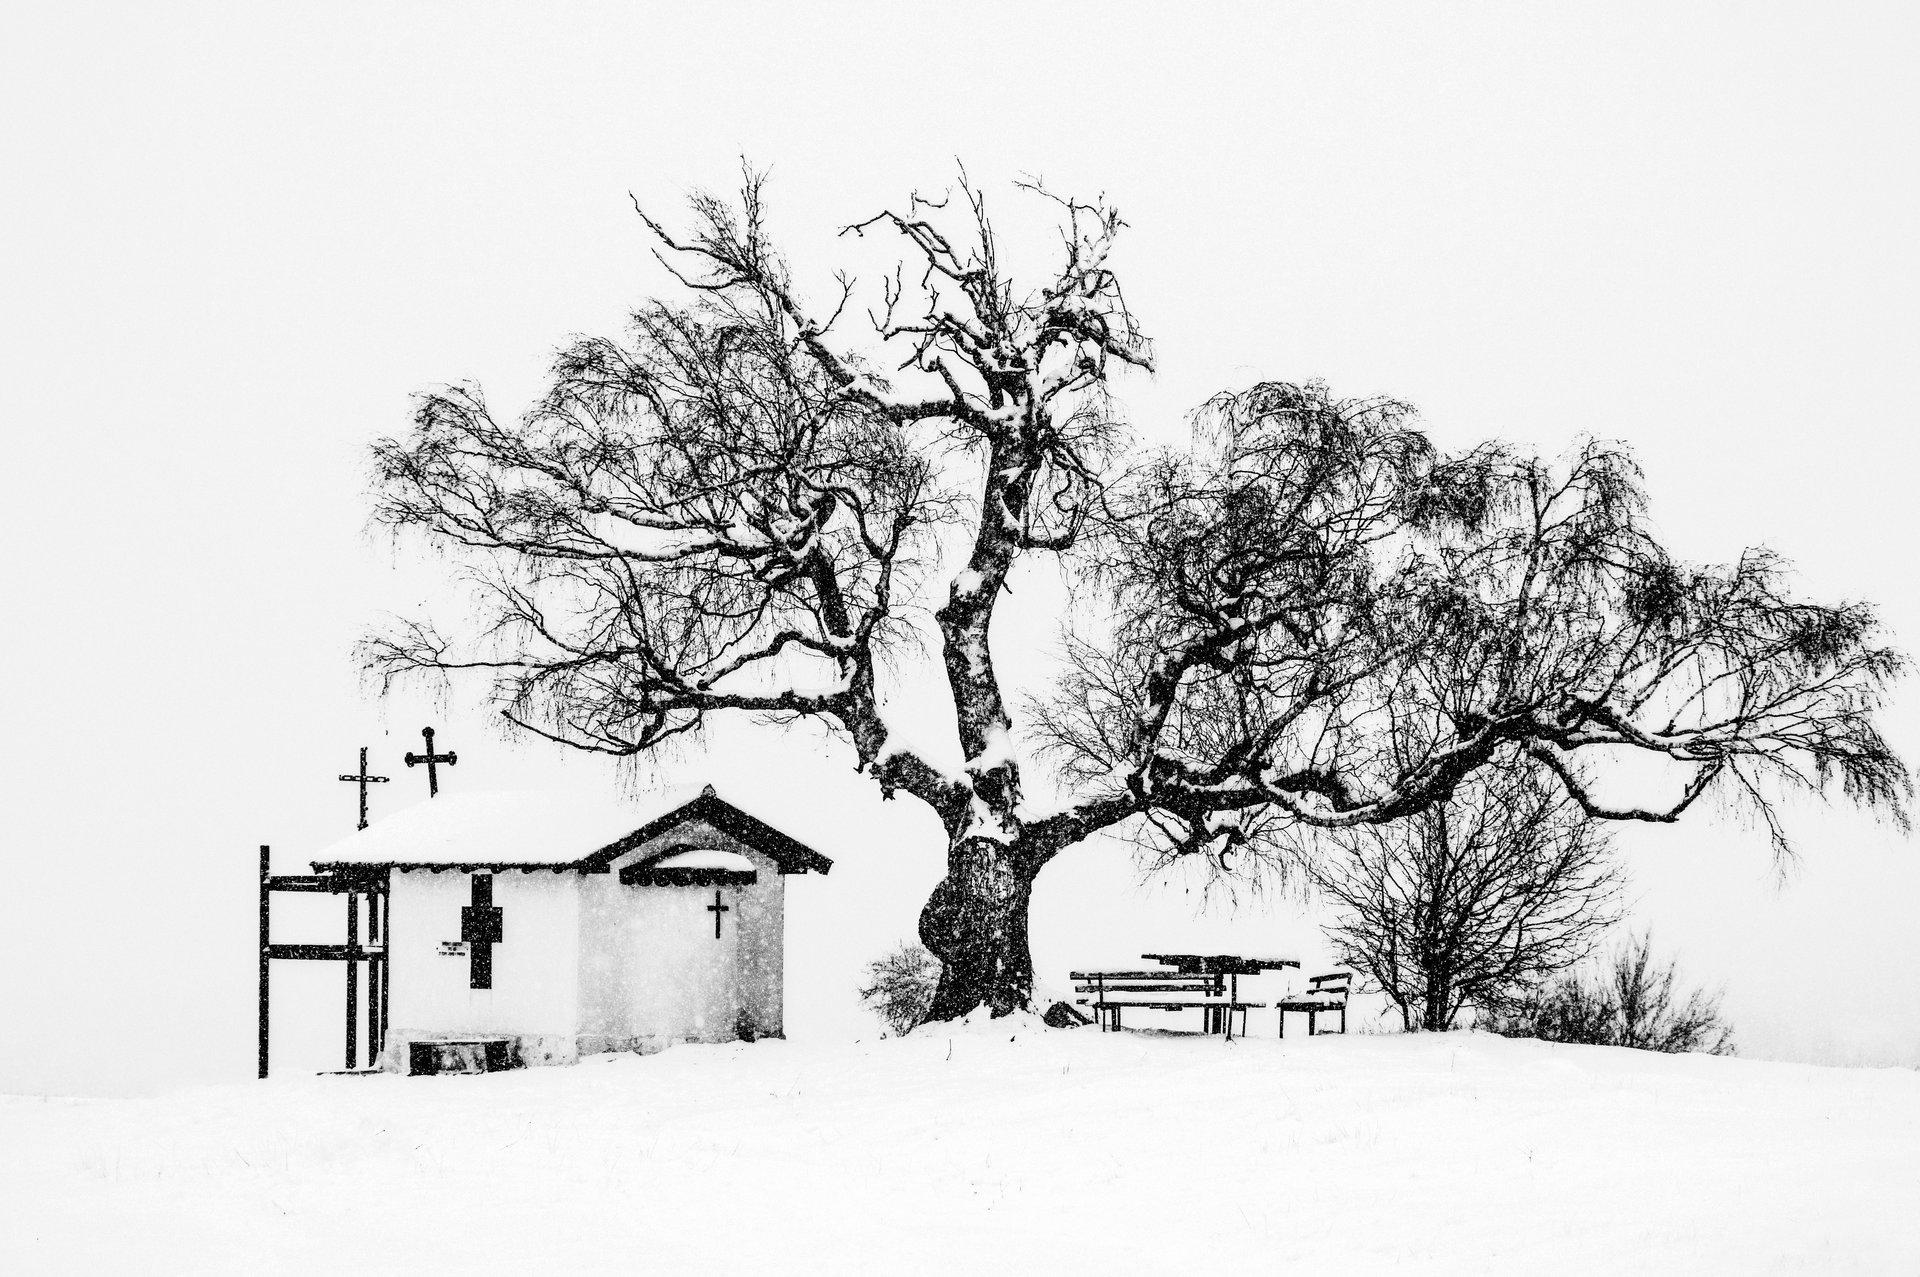 Photo in Landscape | Author sunnyhope | PHOTO FORUM